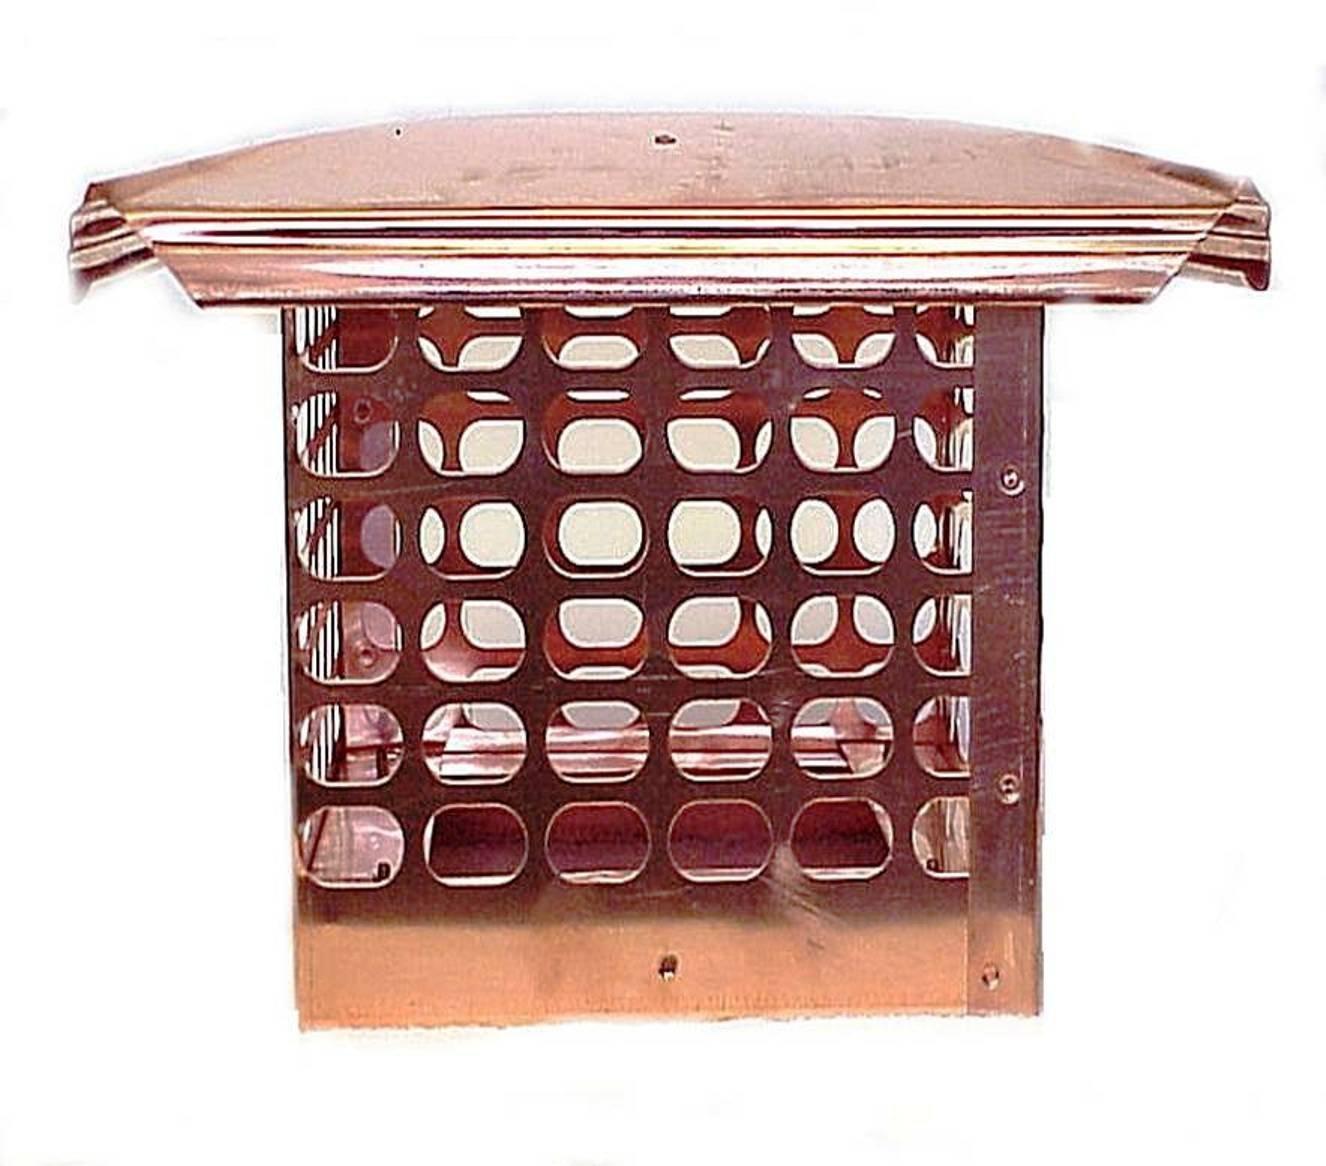 Spark Arrestor Home Depot : Copper chimney cap adding value and protection